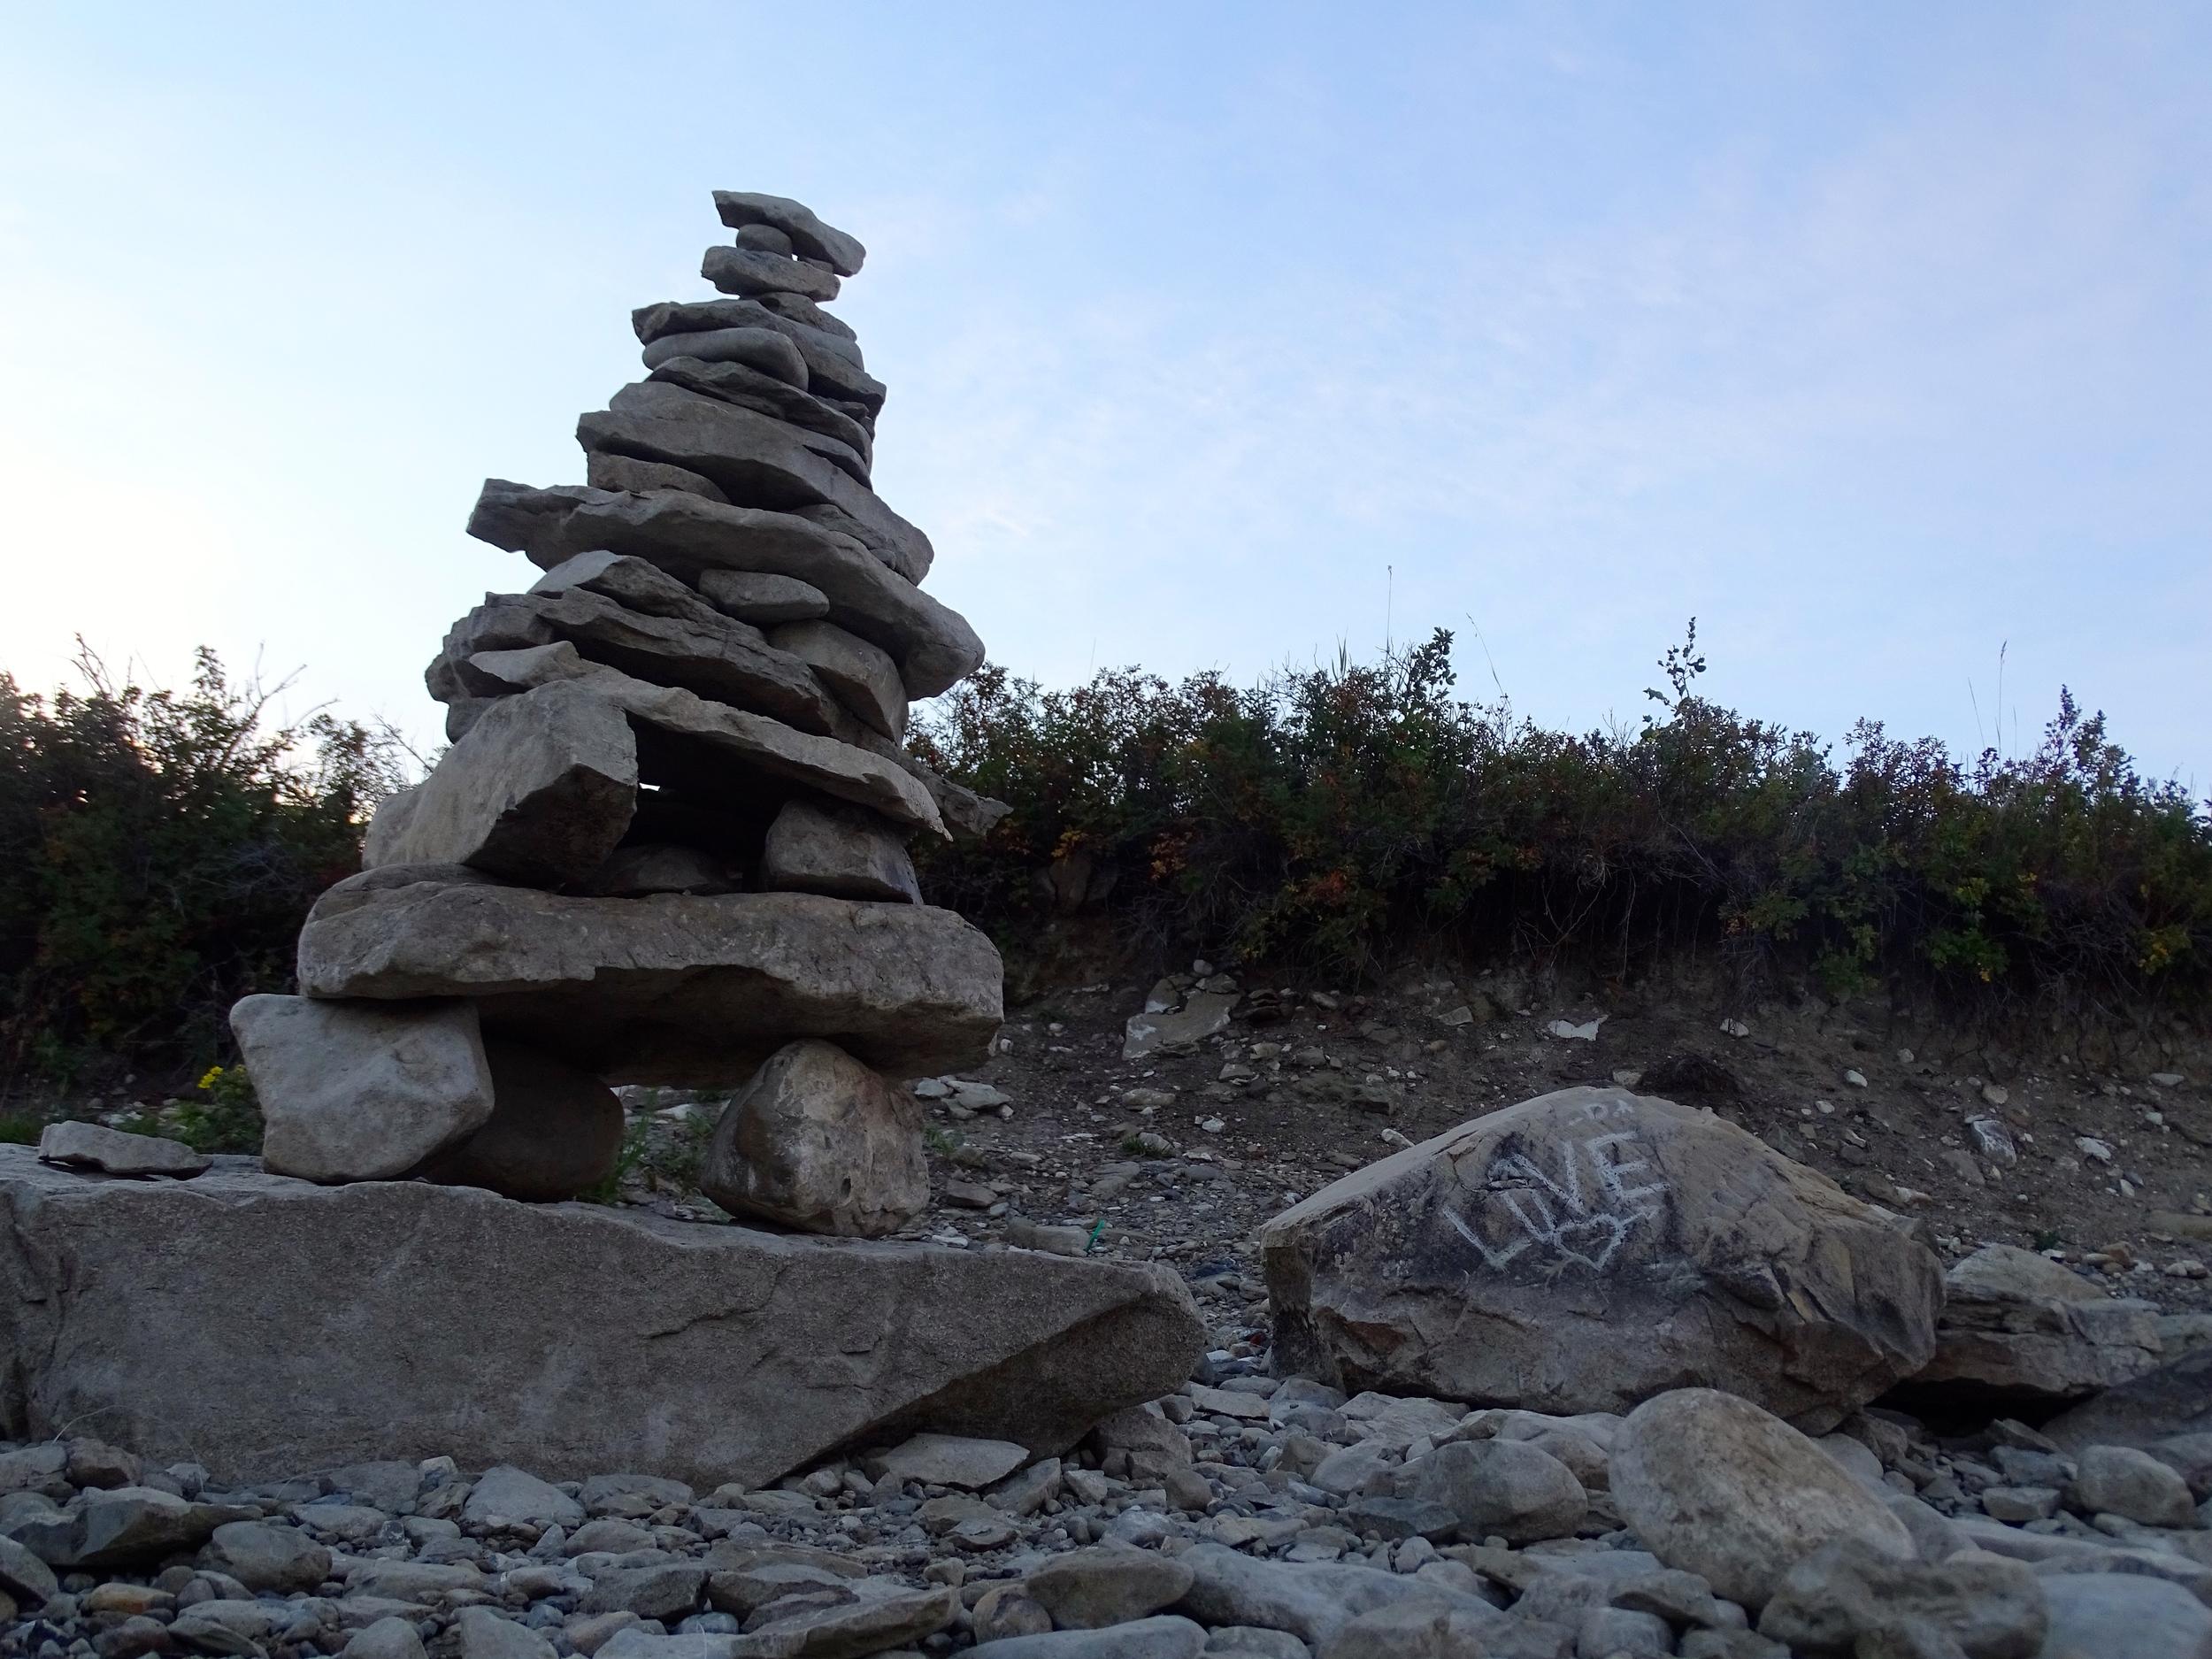 Cairn at Chain Lake